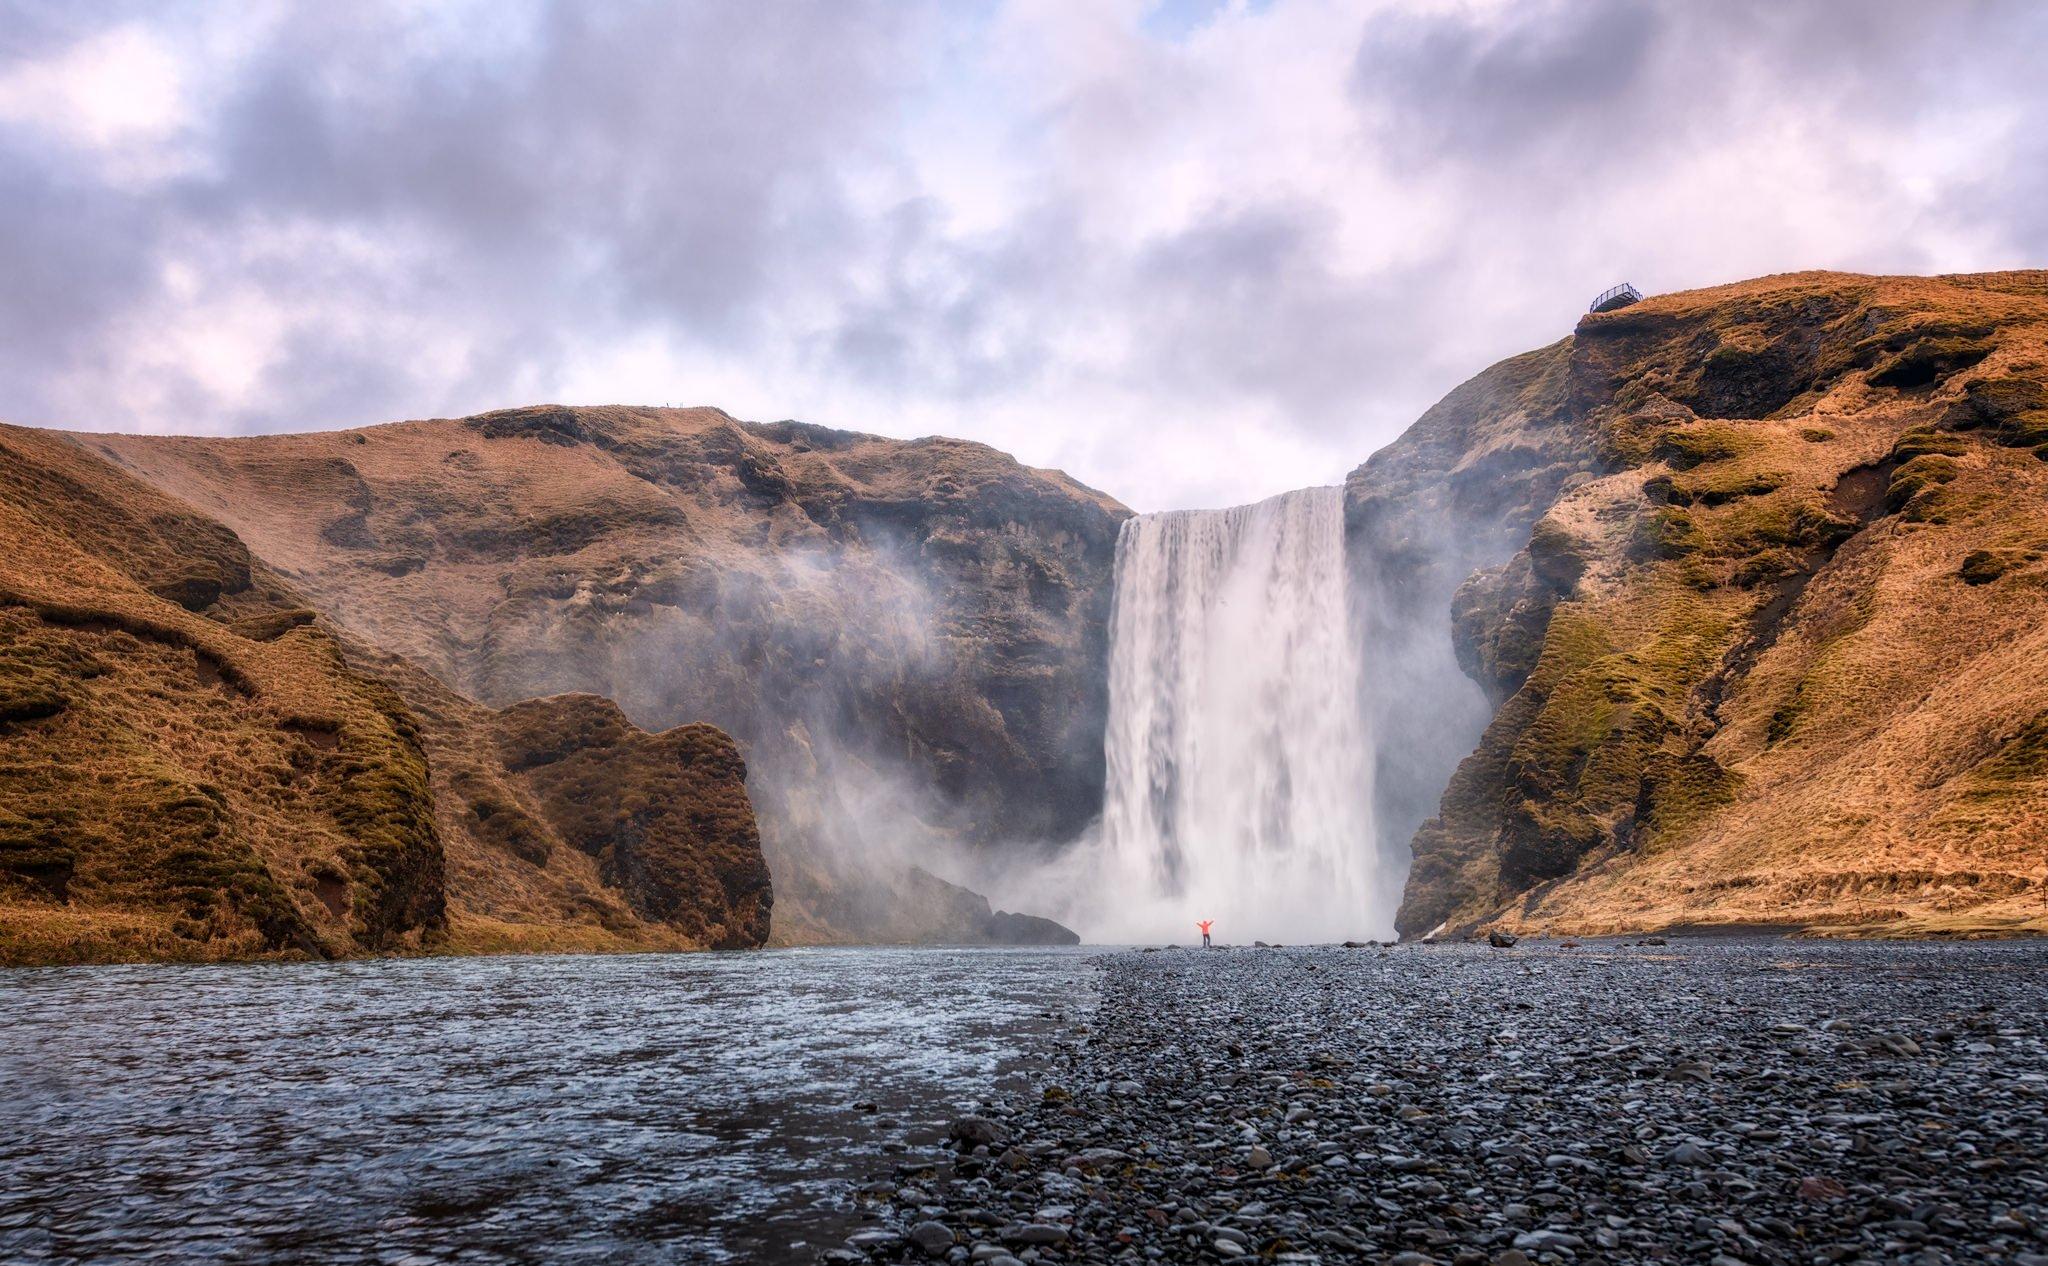 Skógafoss Waterfall; Seljalandfoss on Golden Circle Route - Iceland